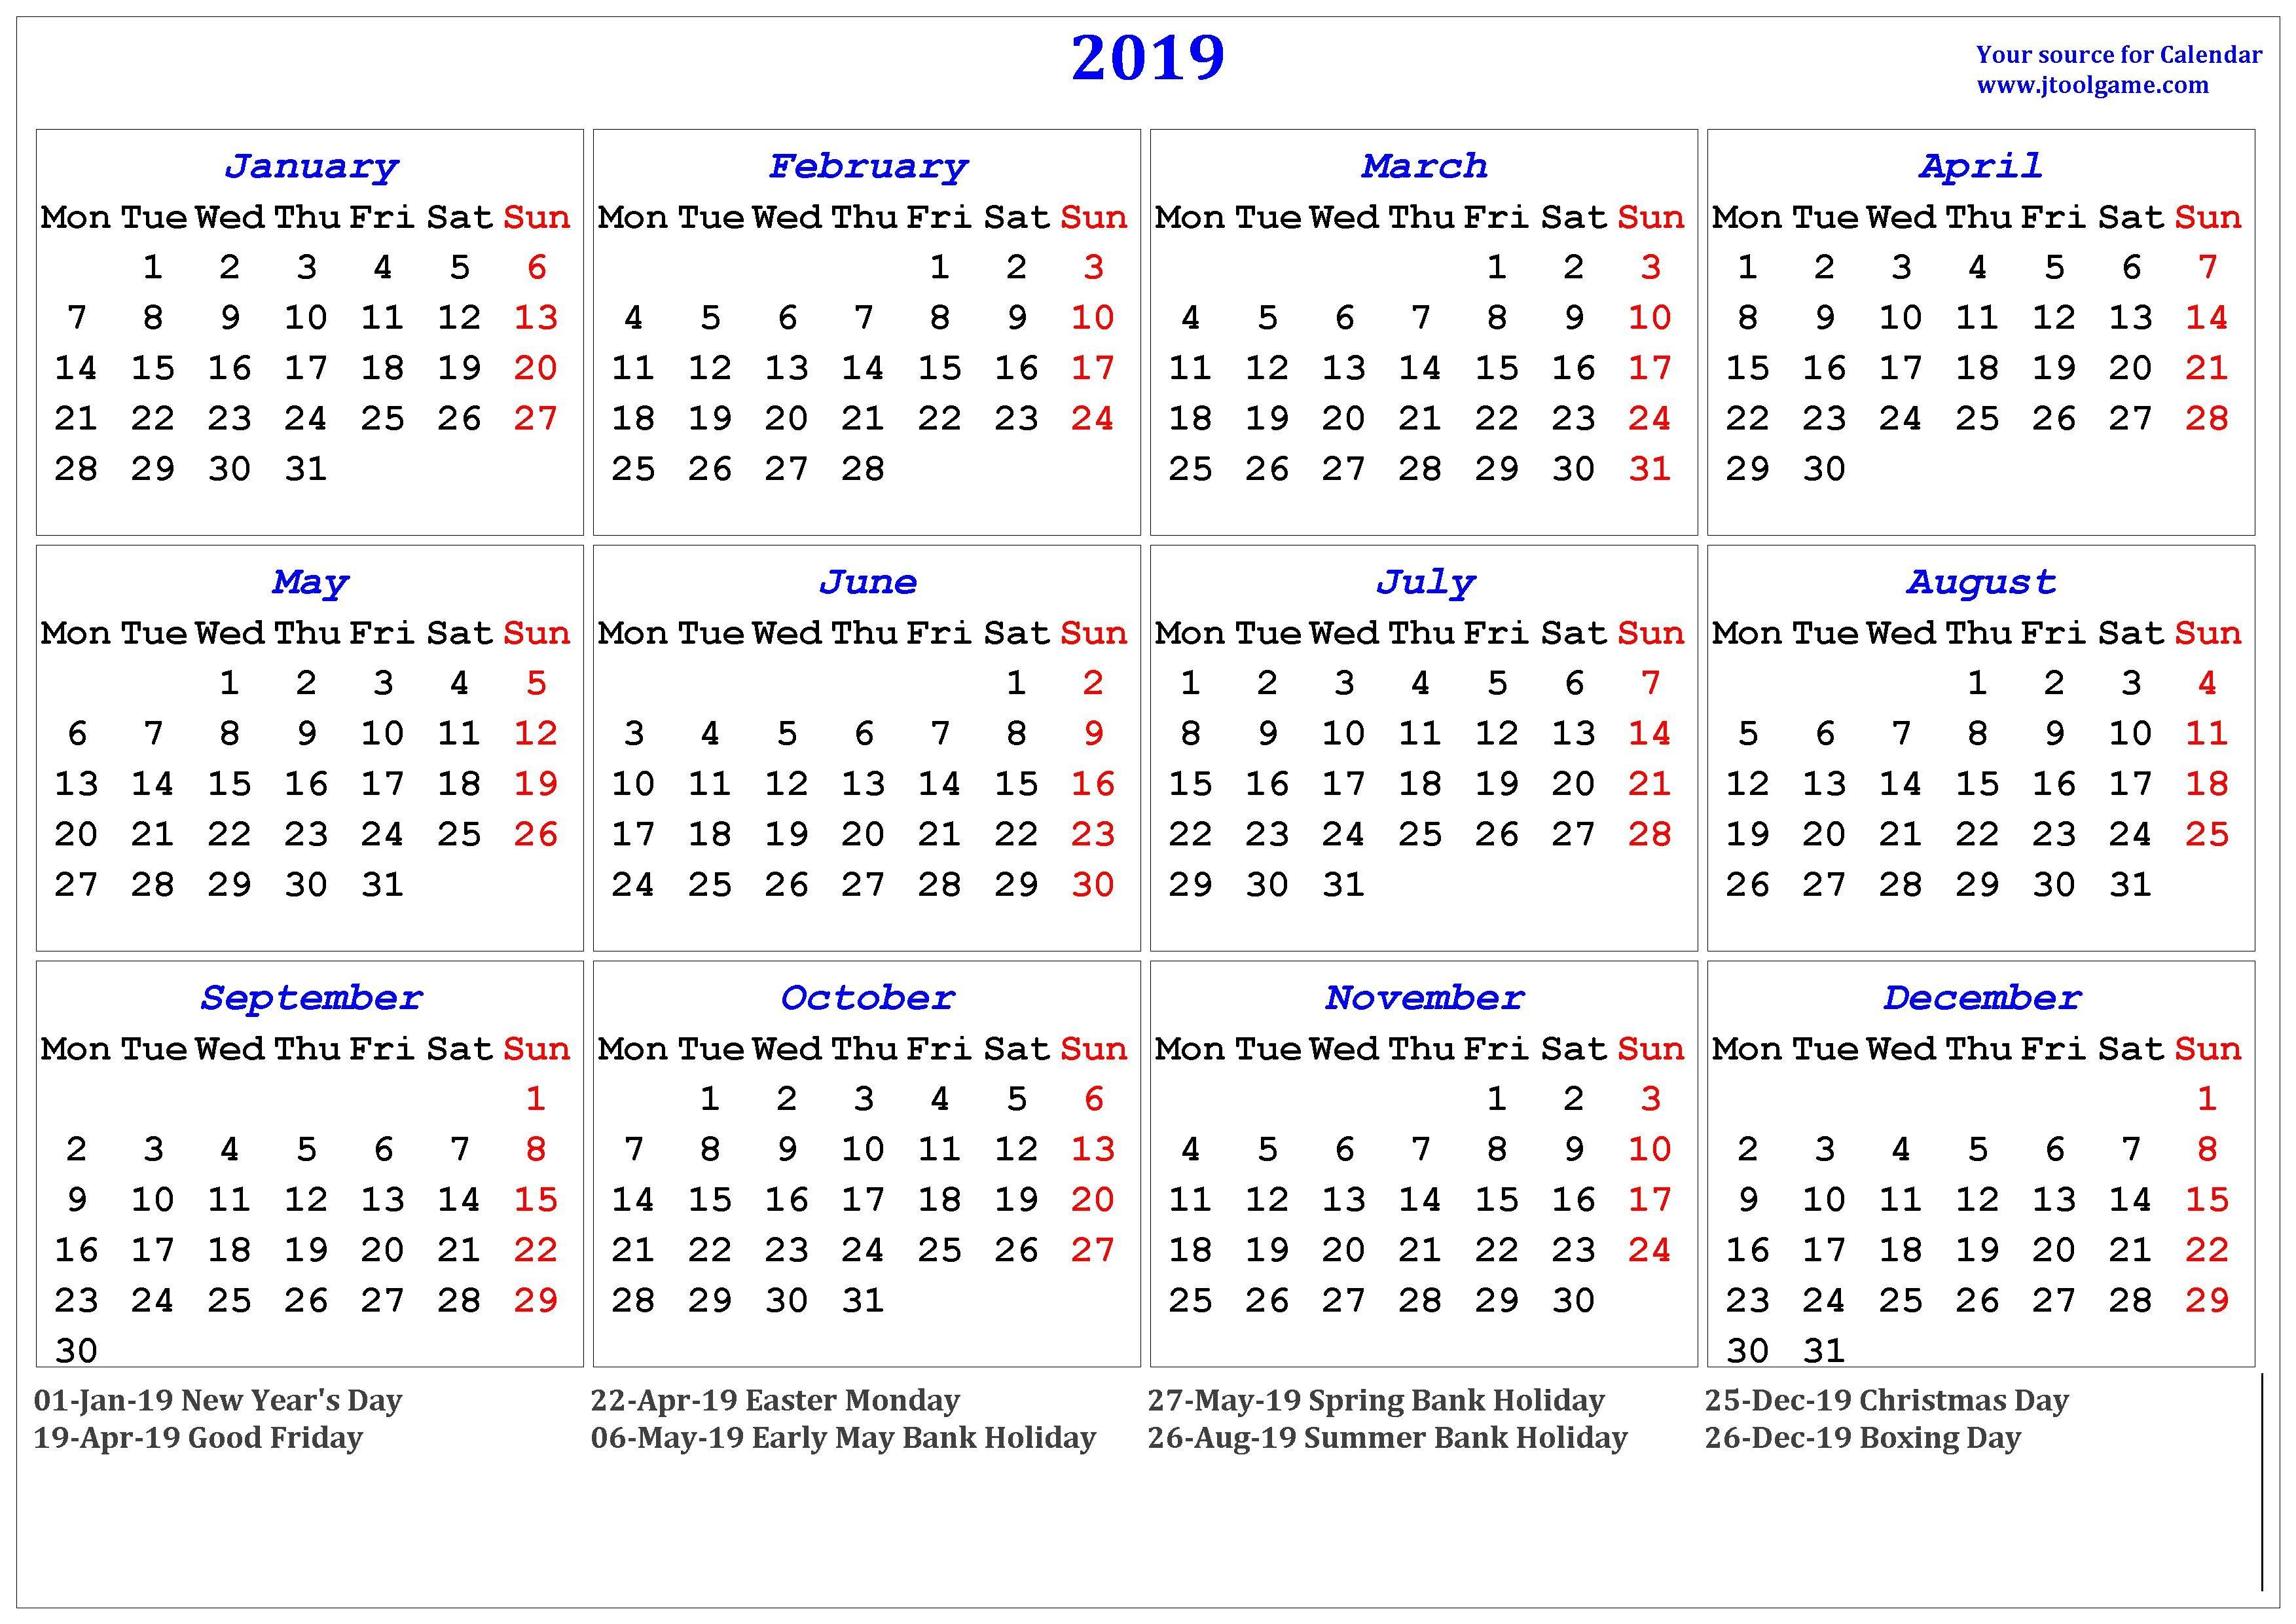 2019 Calendar – Printable Calendar. 2019 Calendar In Multiple Colors Calendar Of 2019 With Holidays